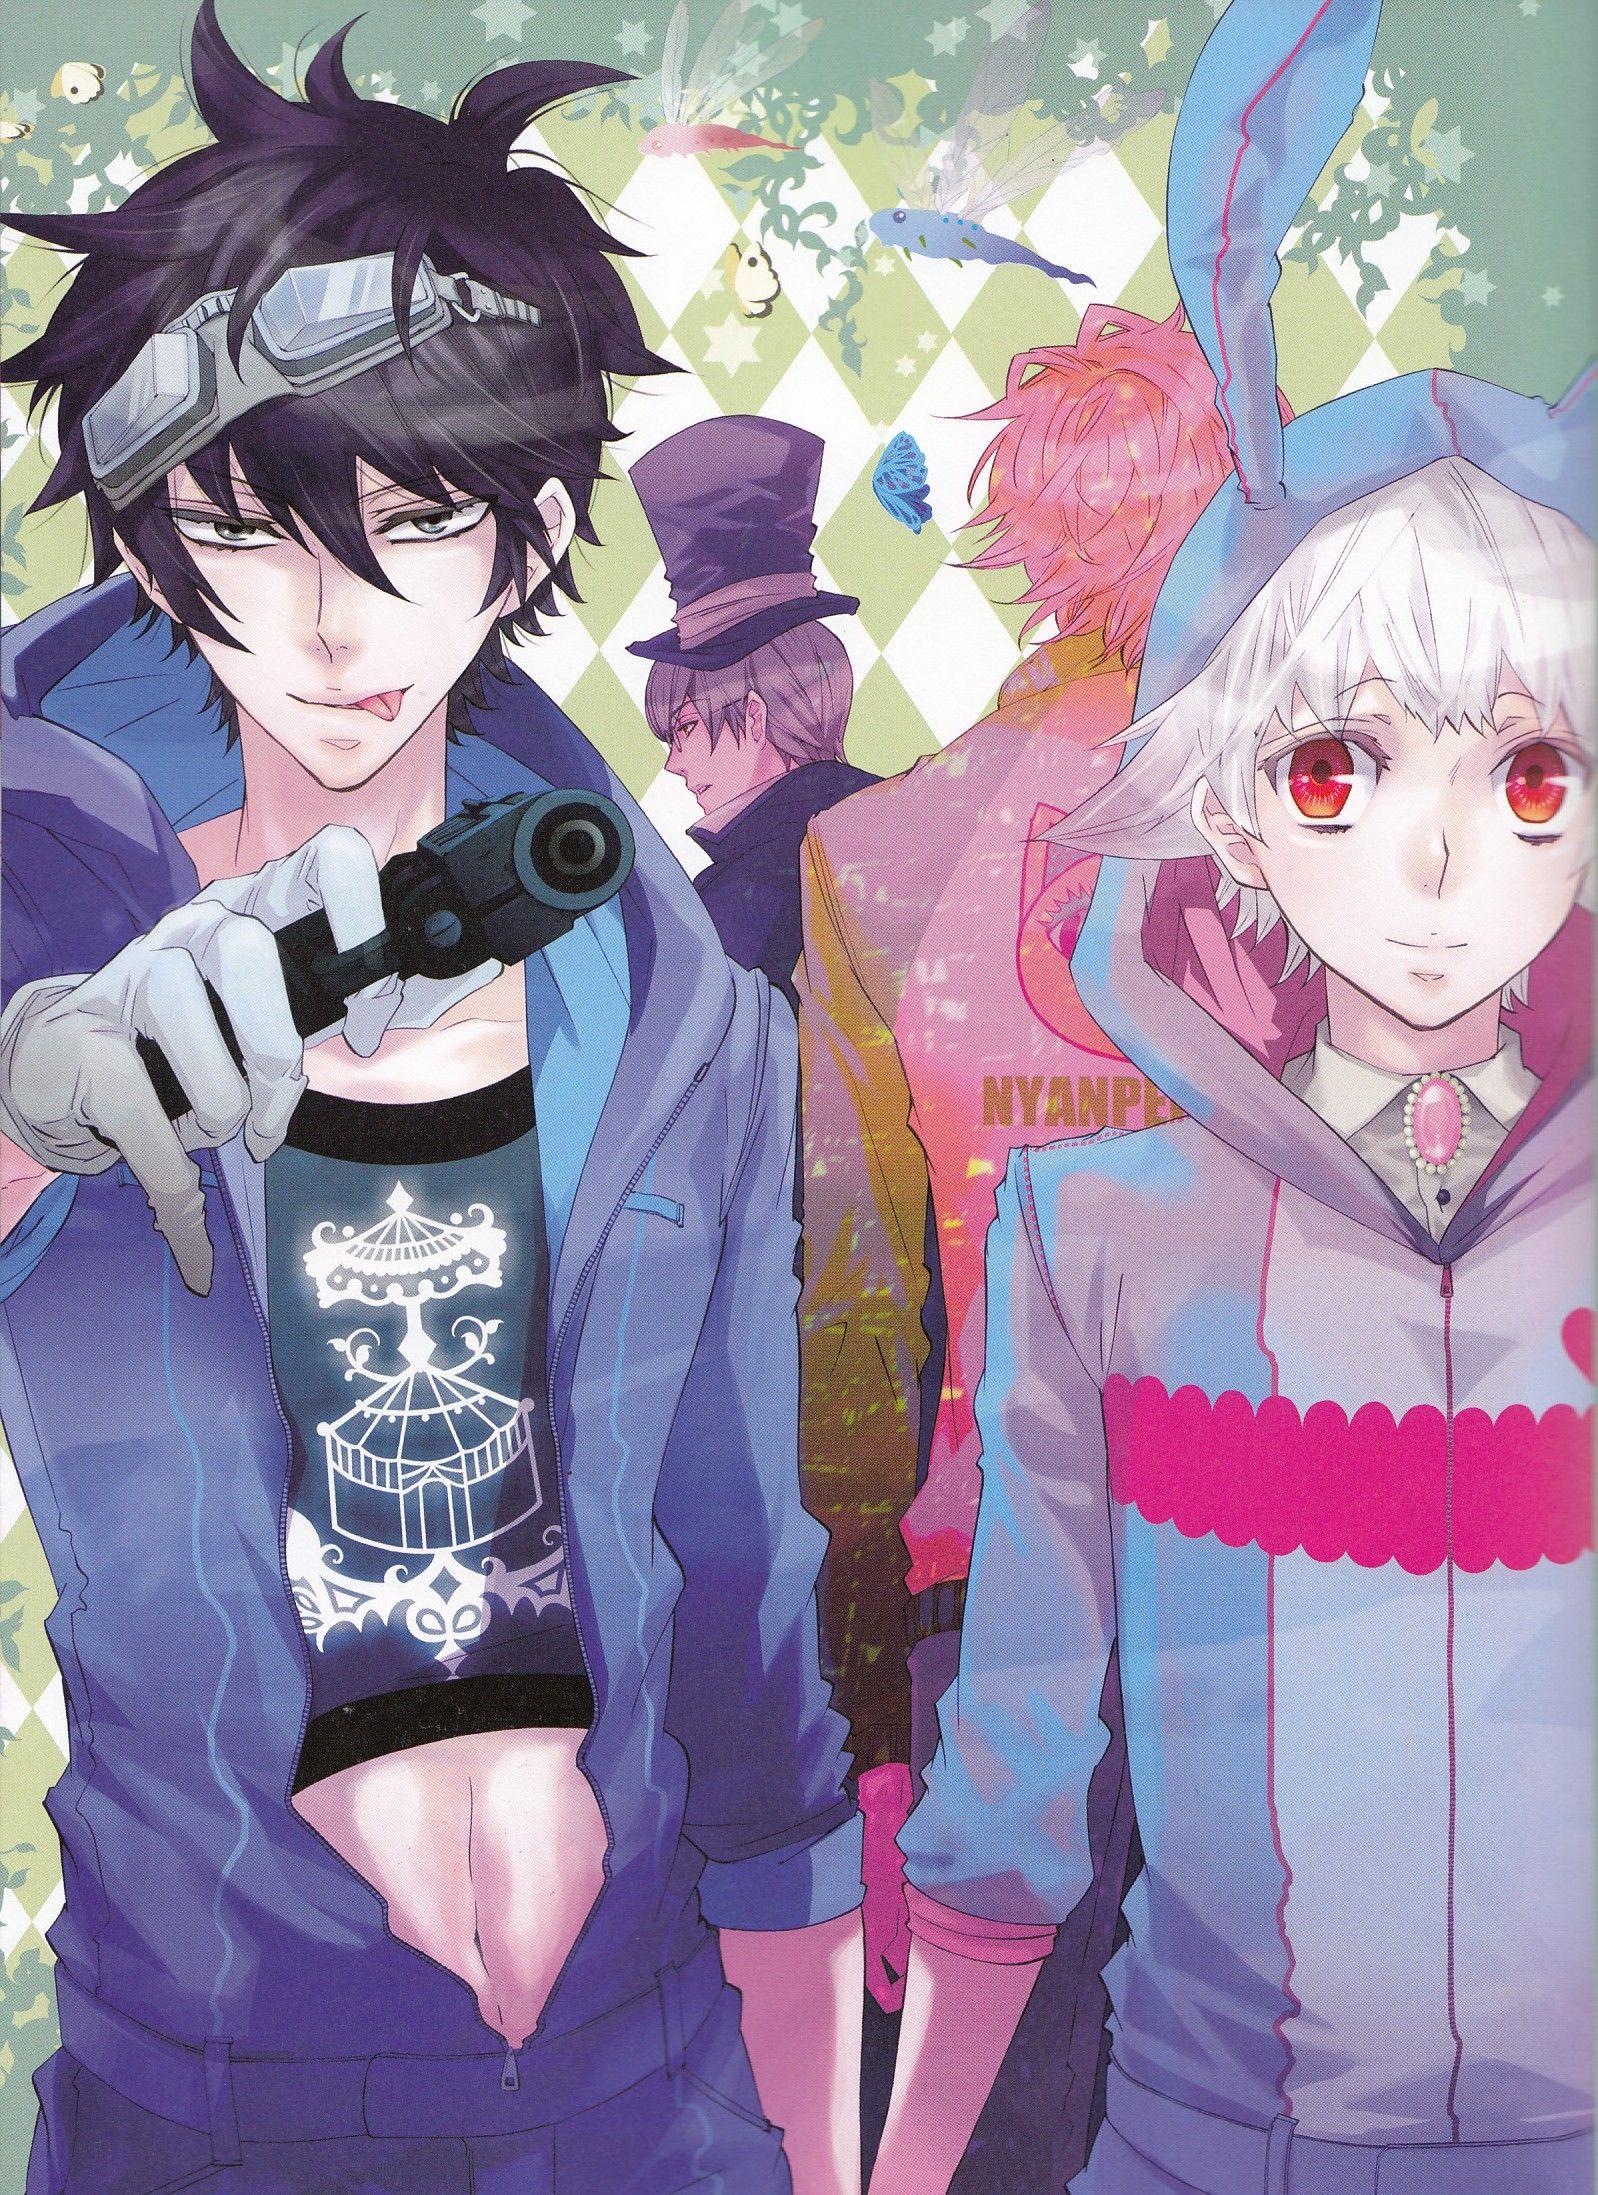 Karneval Gareki & Nai | Karneval | Anime, Manga love ...